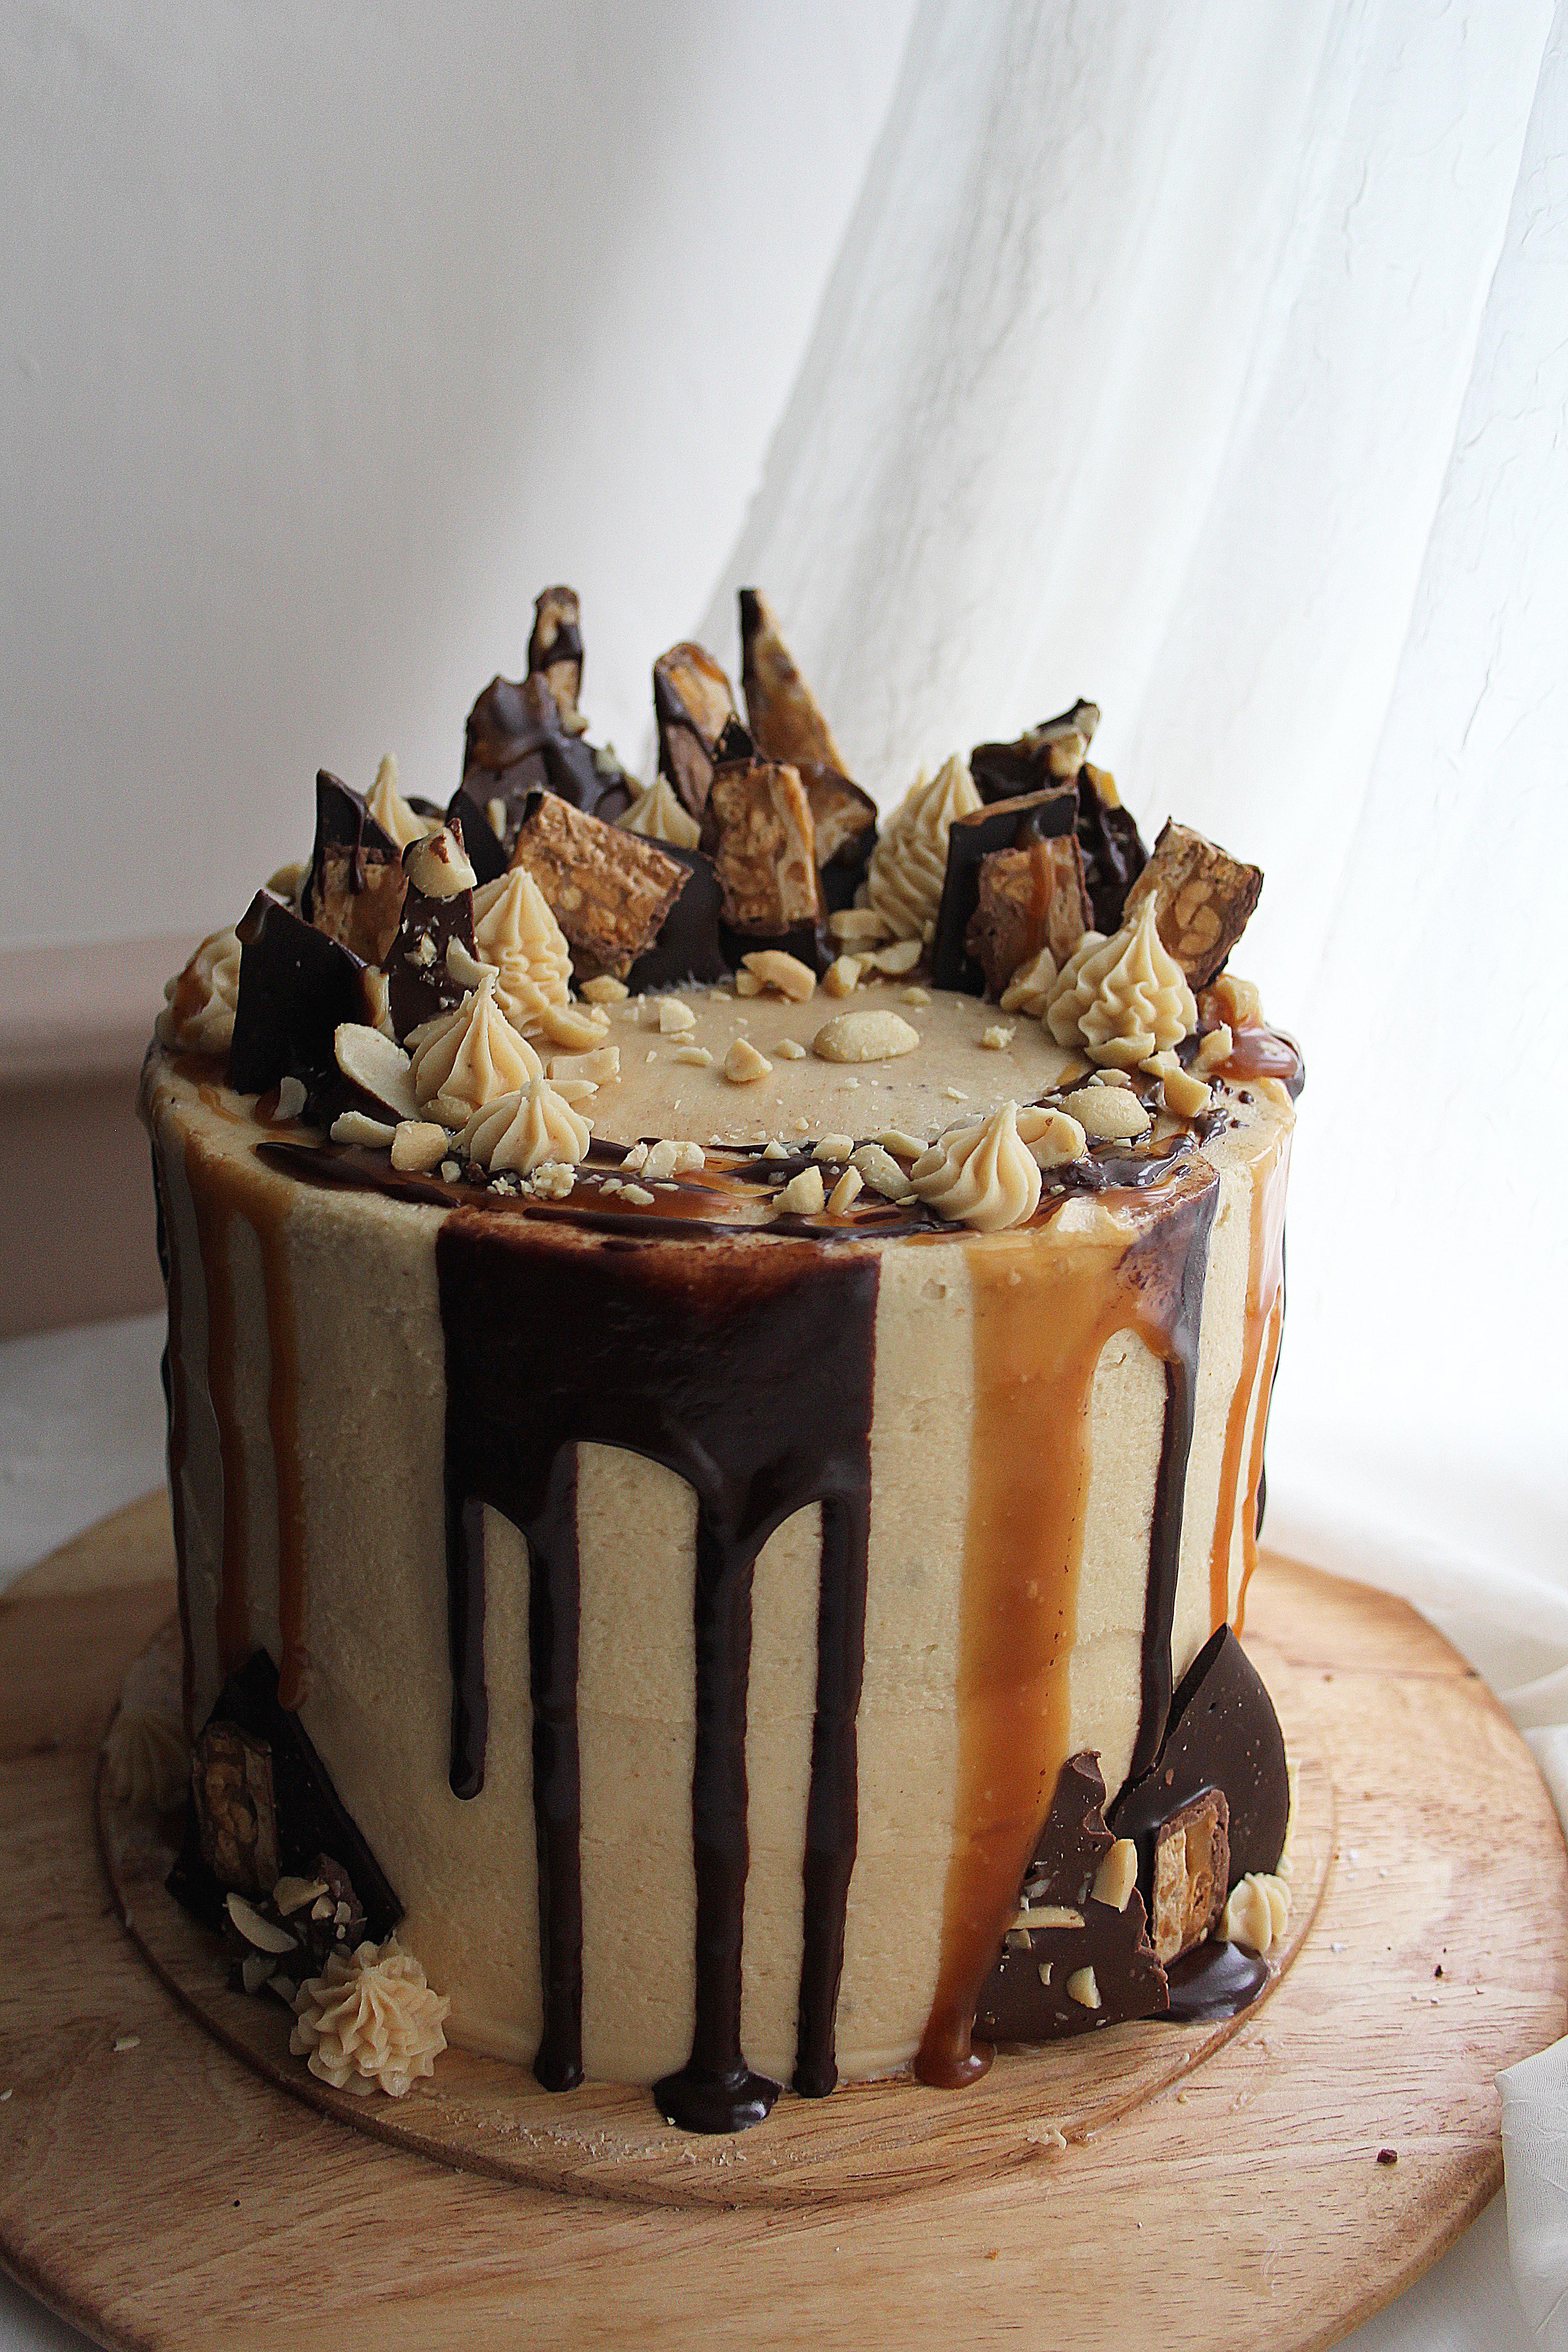 Superb Snickers Celebration Cake Tassybakes Funny Birthday Cards Online Hetedamsfinfo